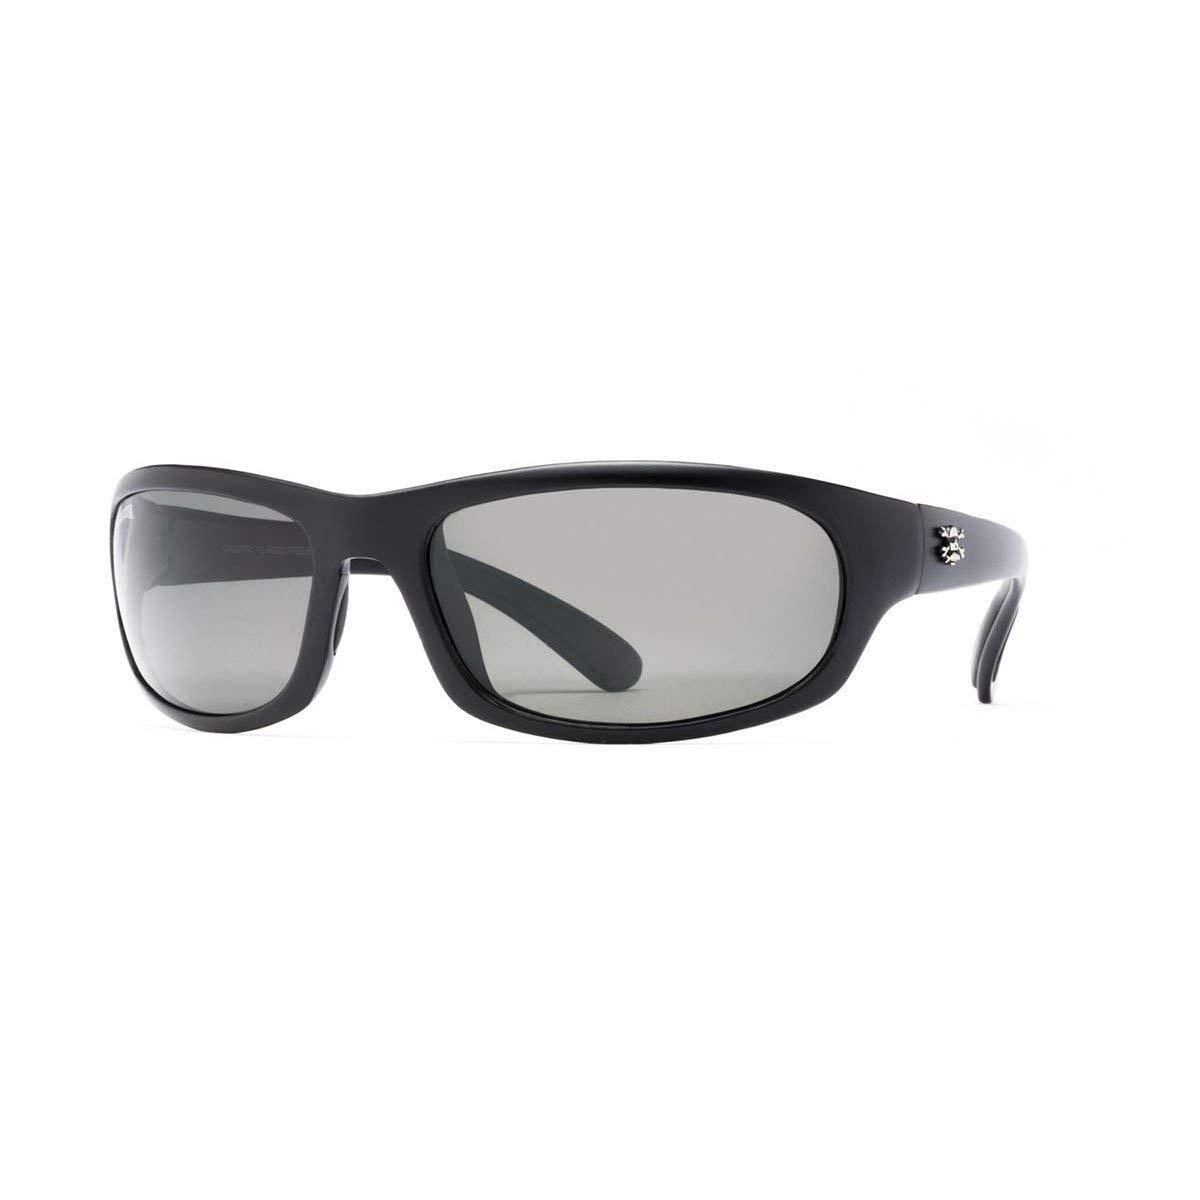 733bc5d23e Calcutta Steelhead Sunglasses (Tortoise Frame